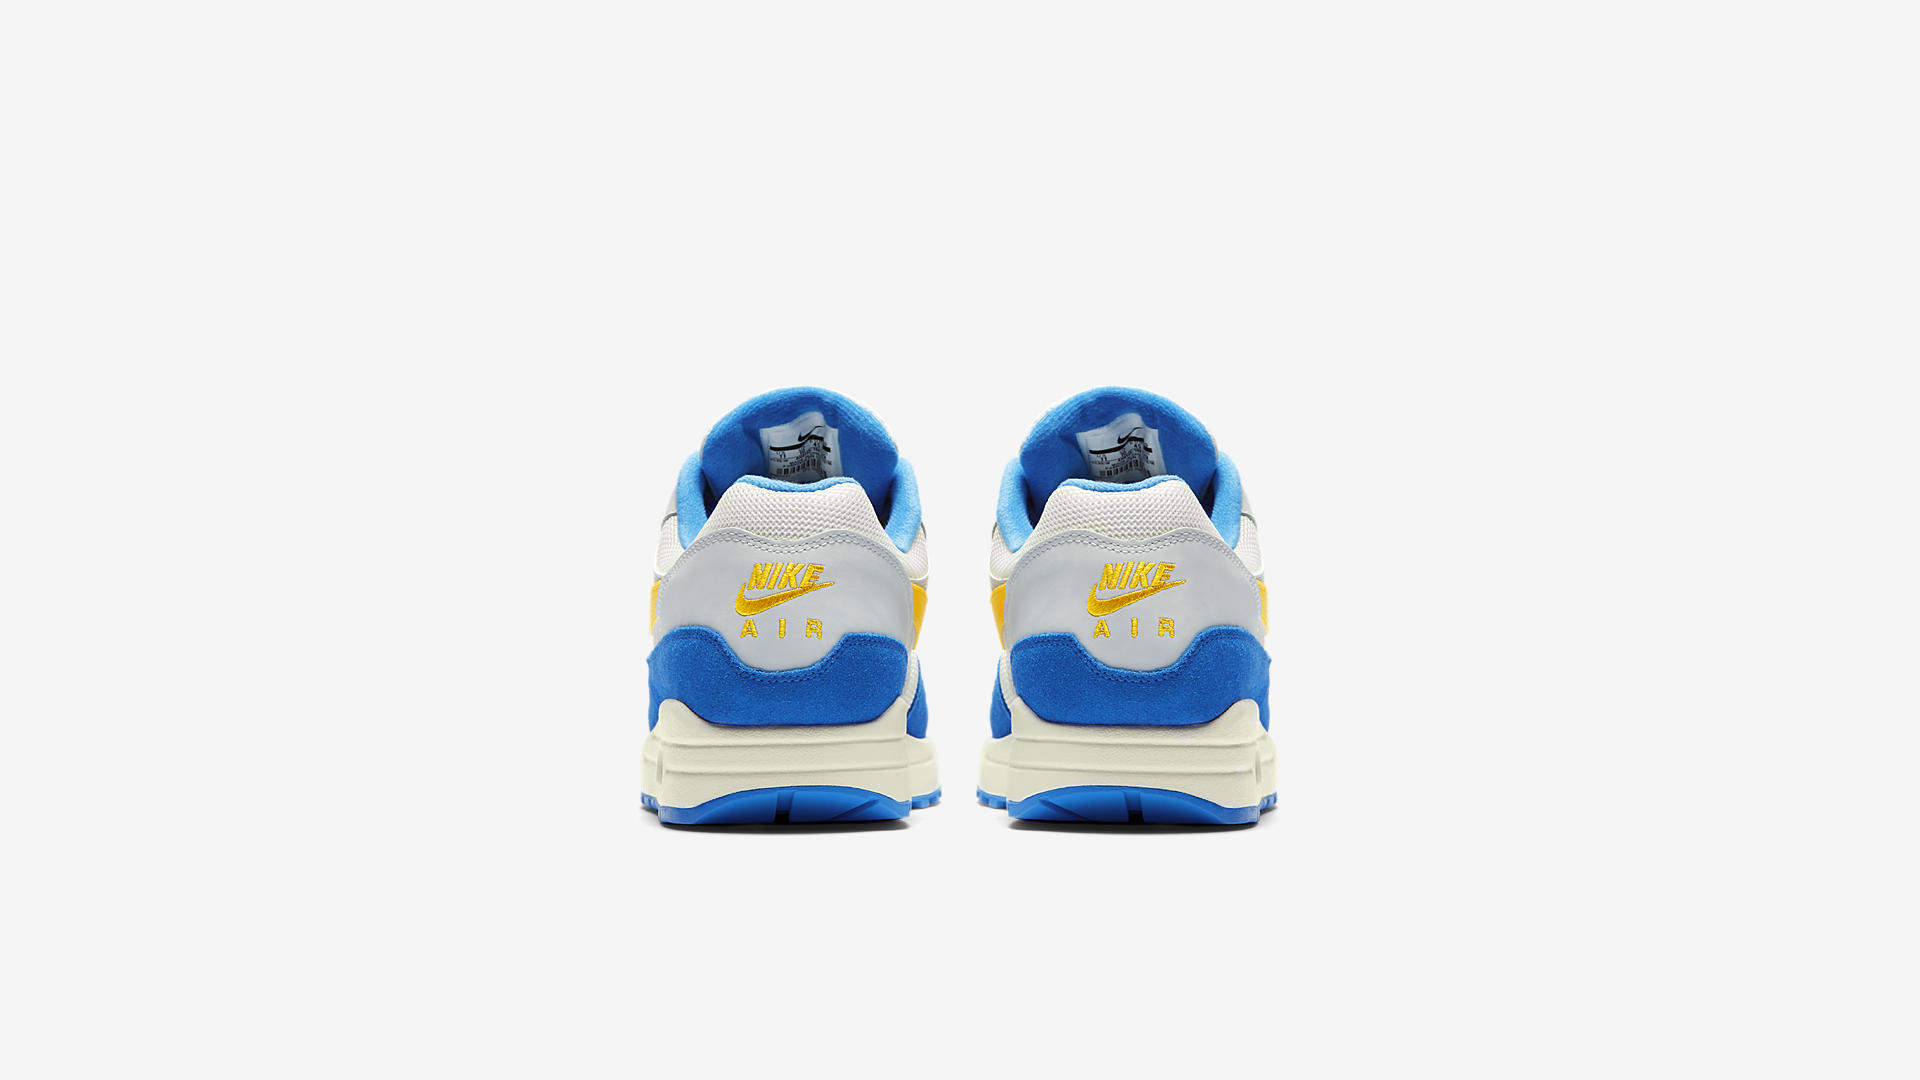 Nike Air Max 1 AH8145-108